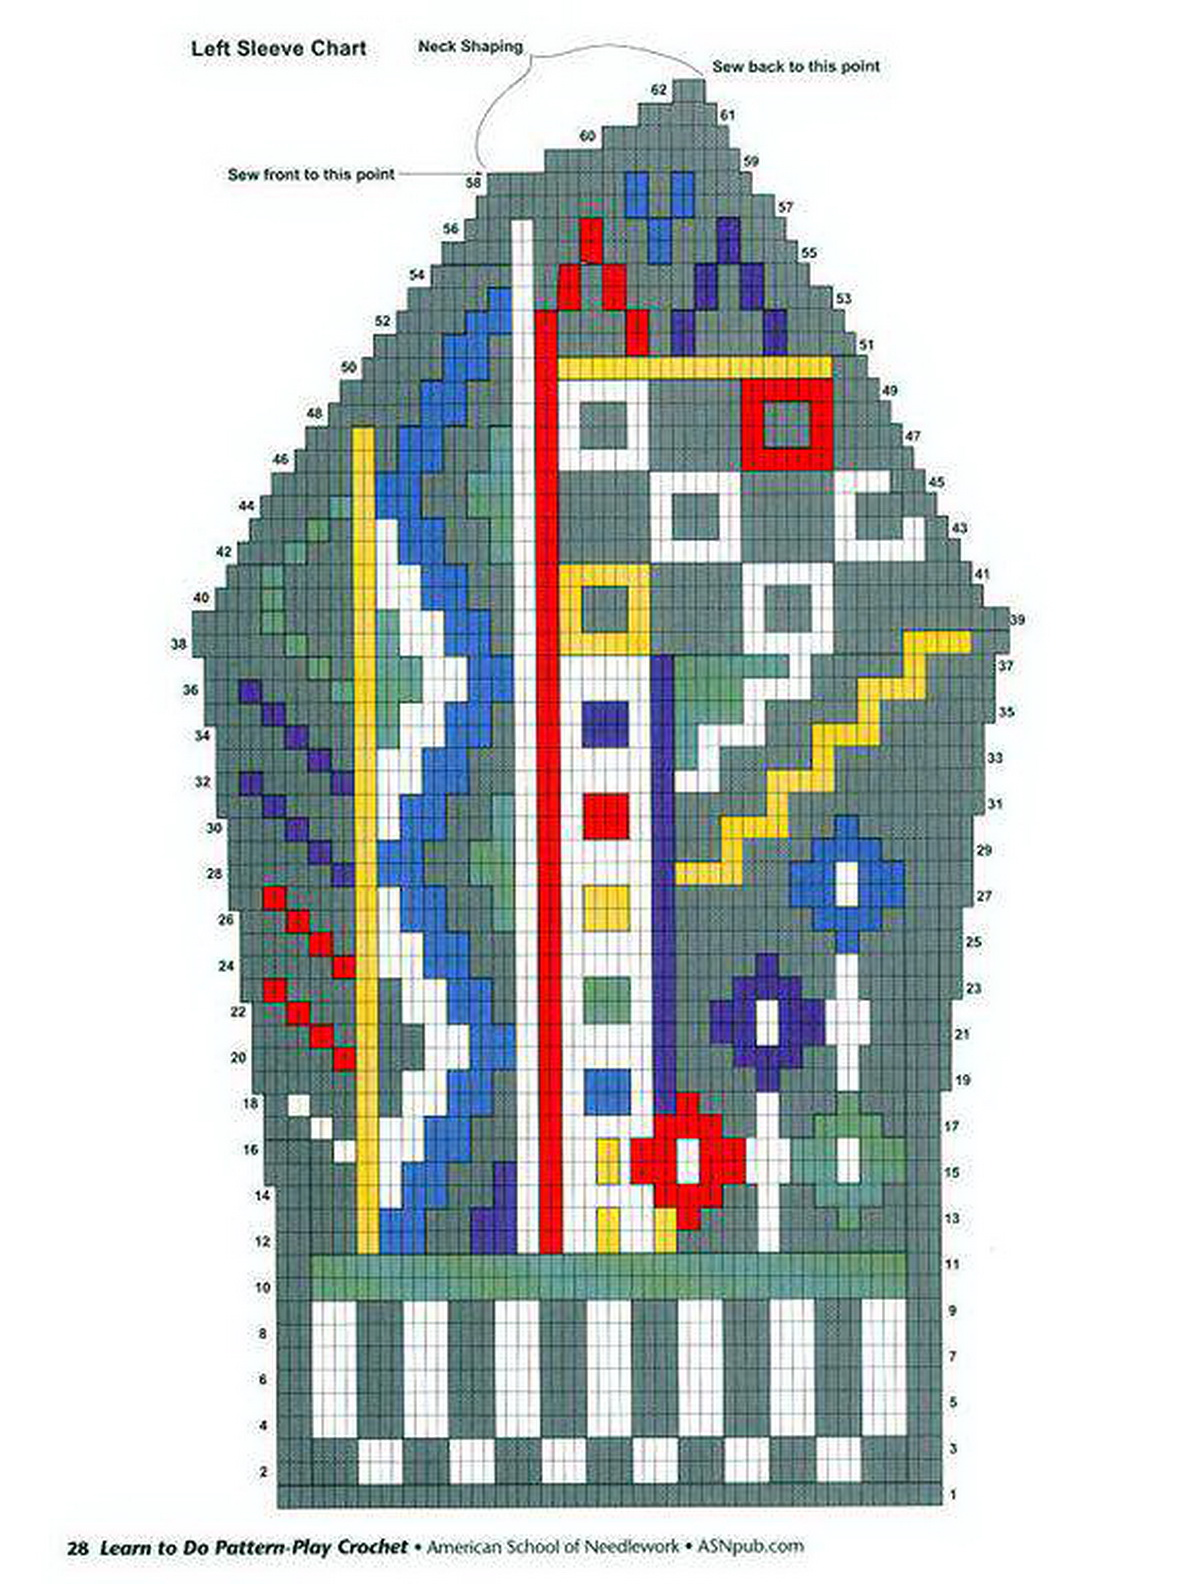 0245_Learn to do pattern-play crochet (6)